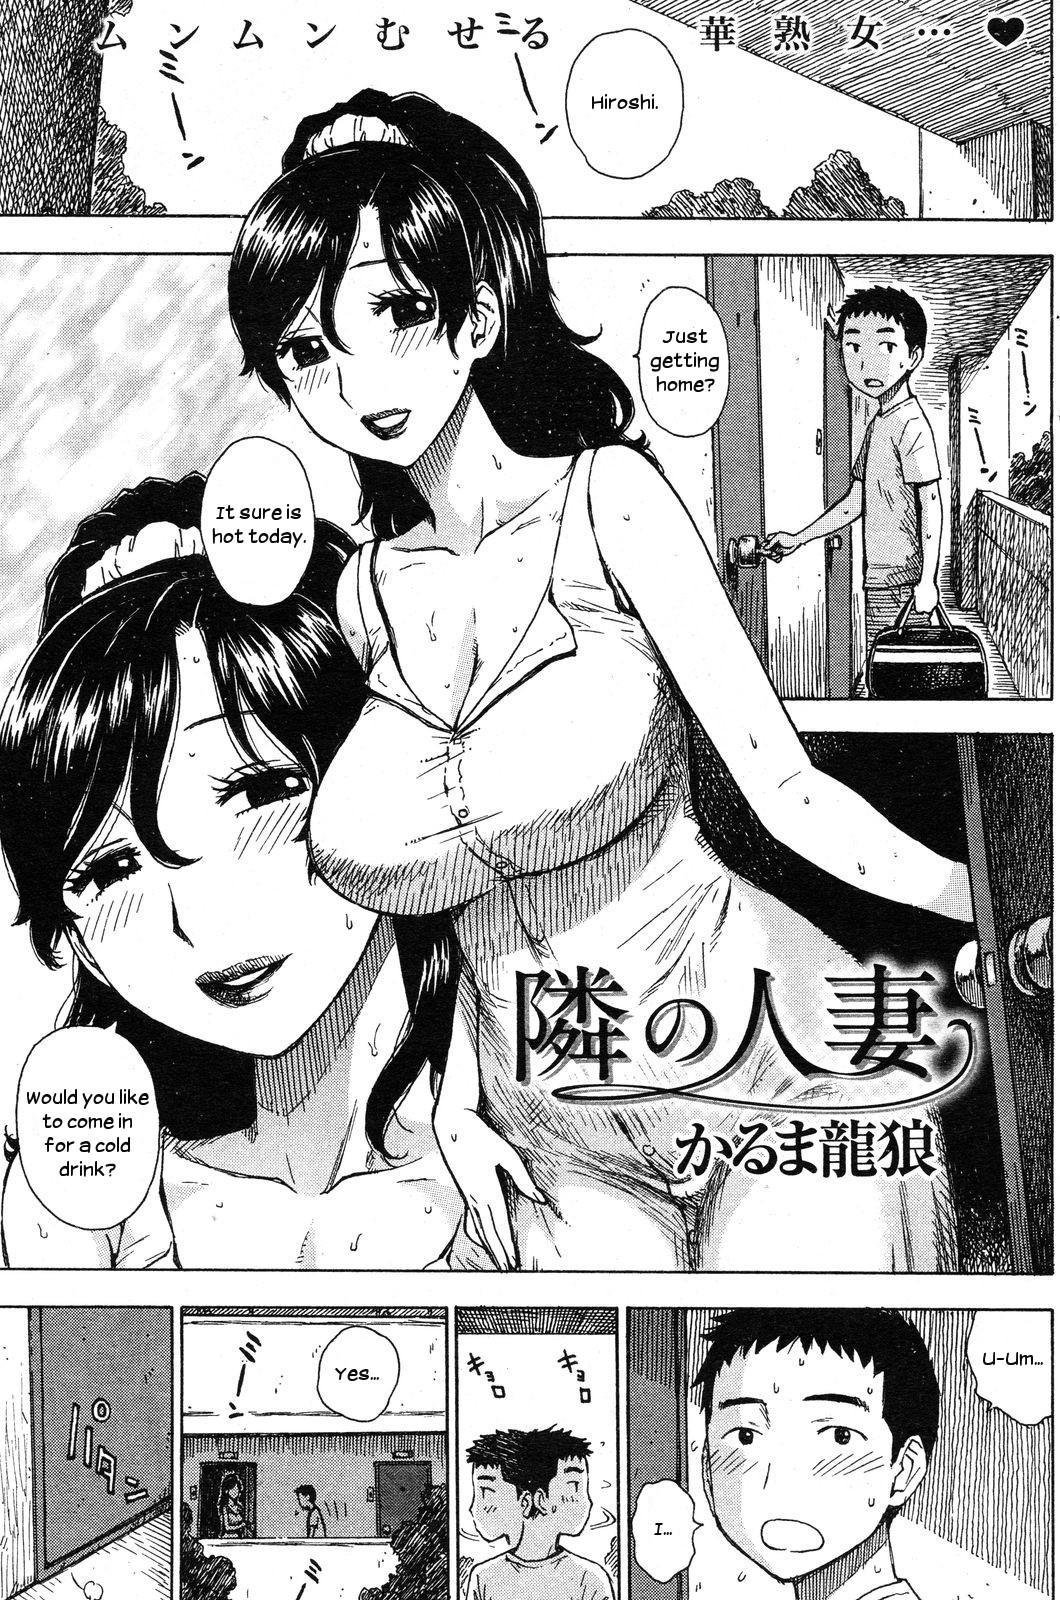 Tonari no Hitozuma | The Wife Next Door 0